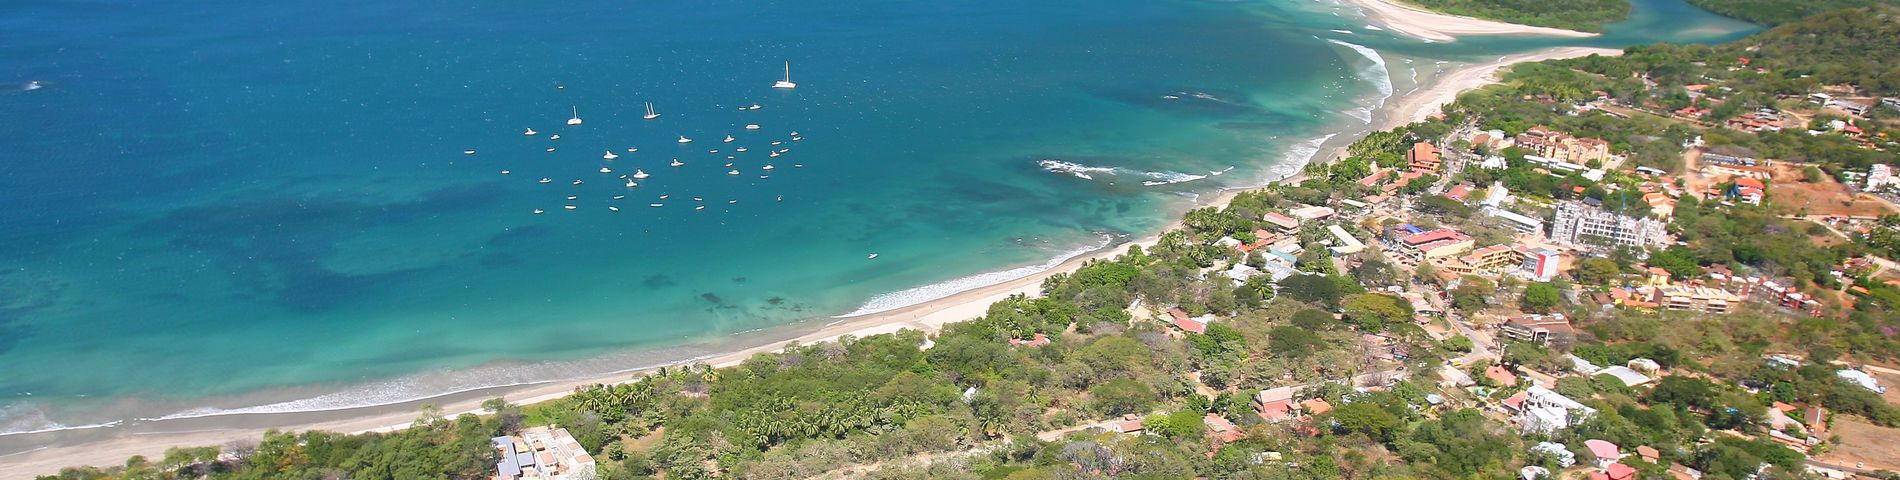 ISLS: Playa Tamarindo - ISLS: Institute for Spanish ...